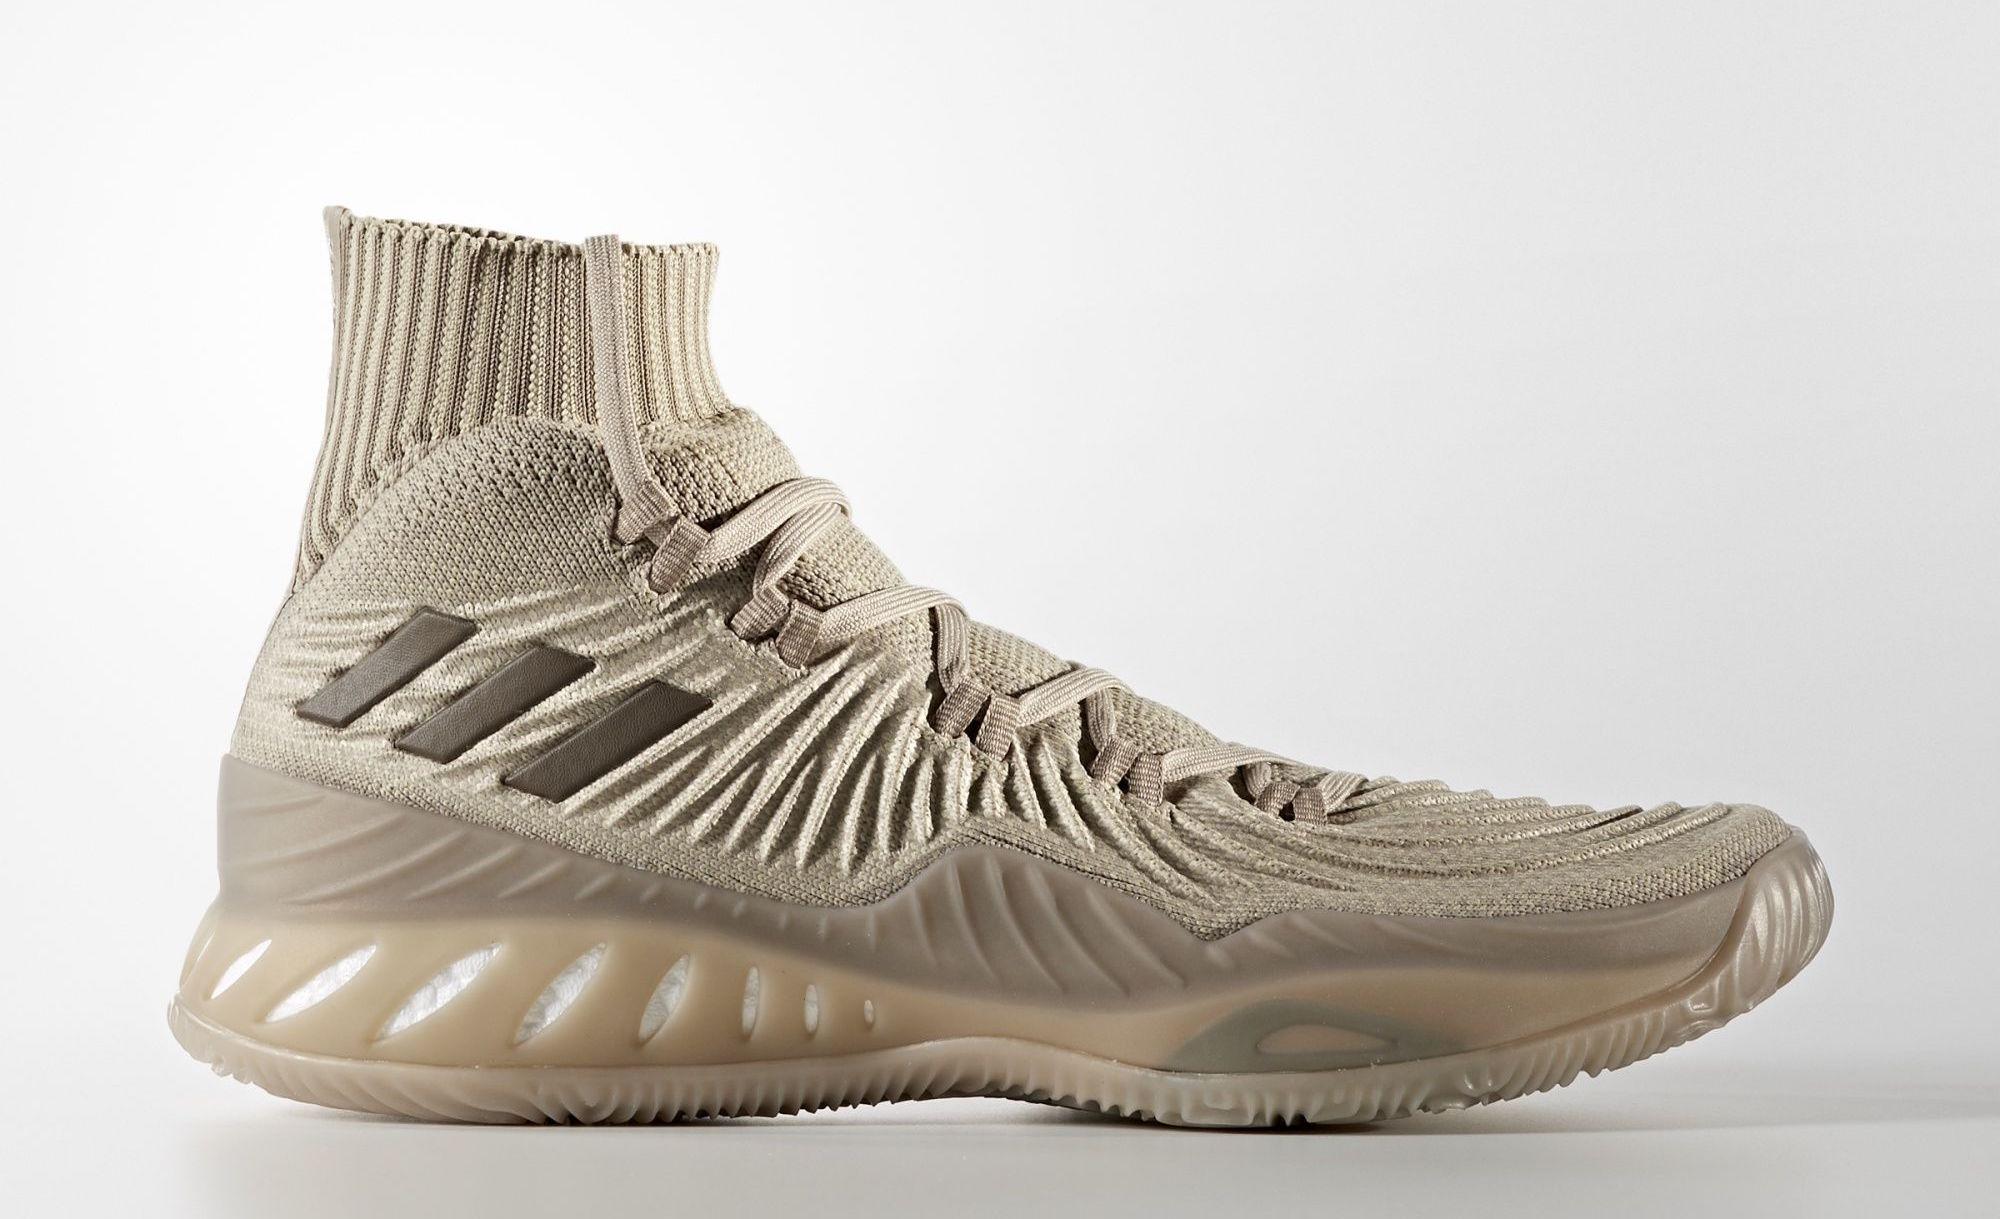 separation shoes 61550 29322 adidas crazy explosive 2017 trace khaki 2 · adidas   Kicks On Court ...